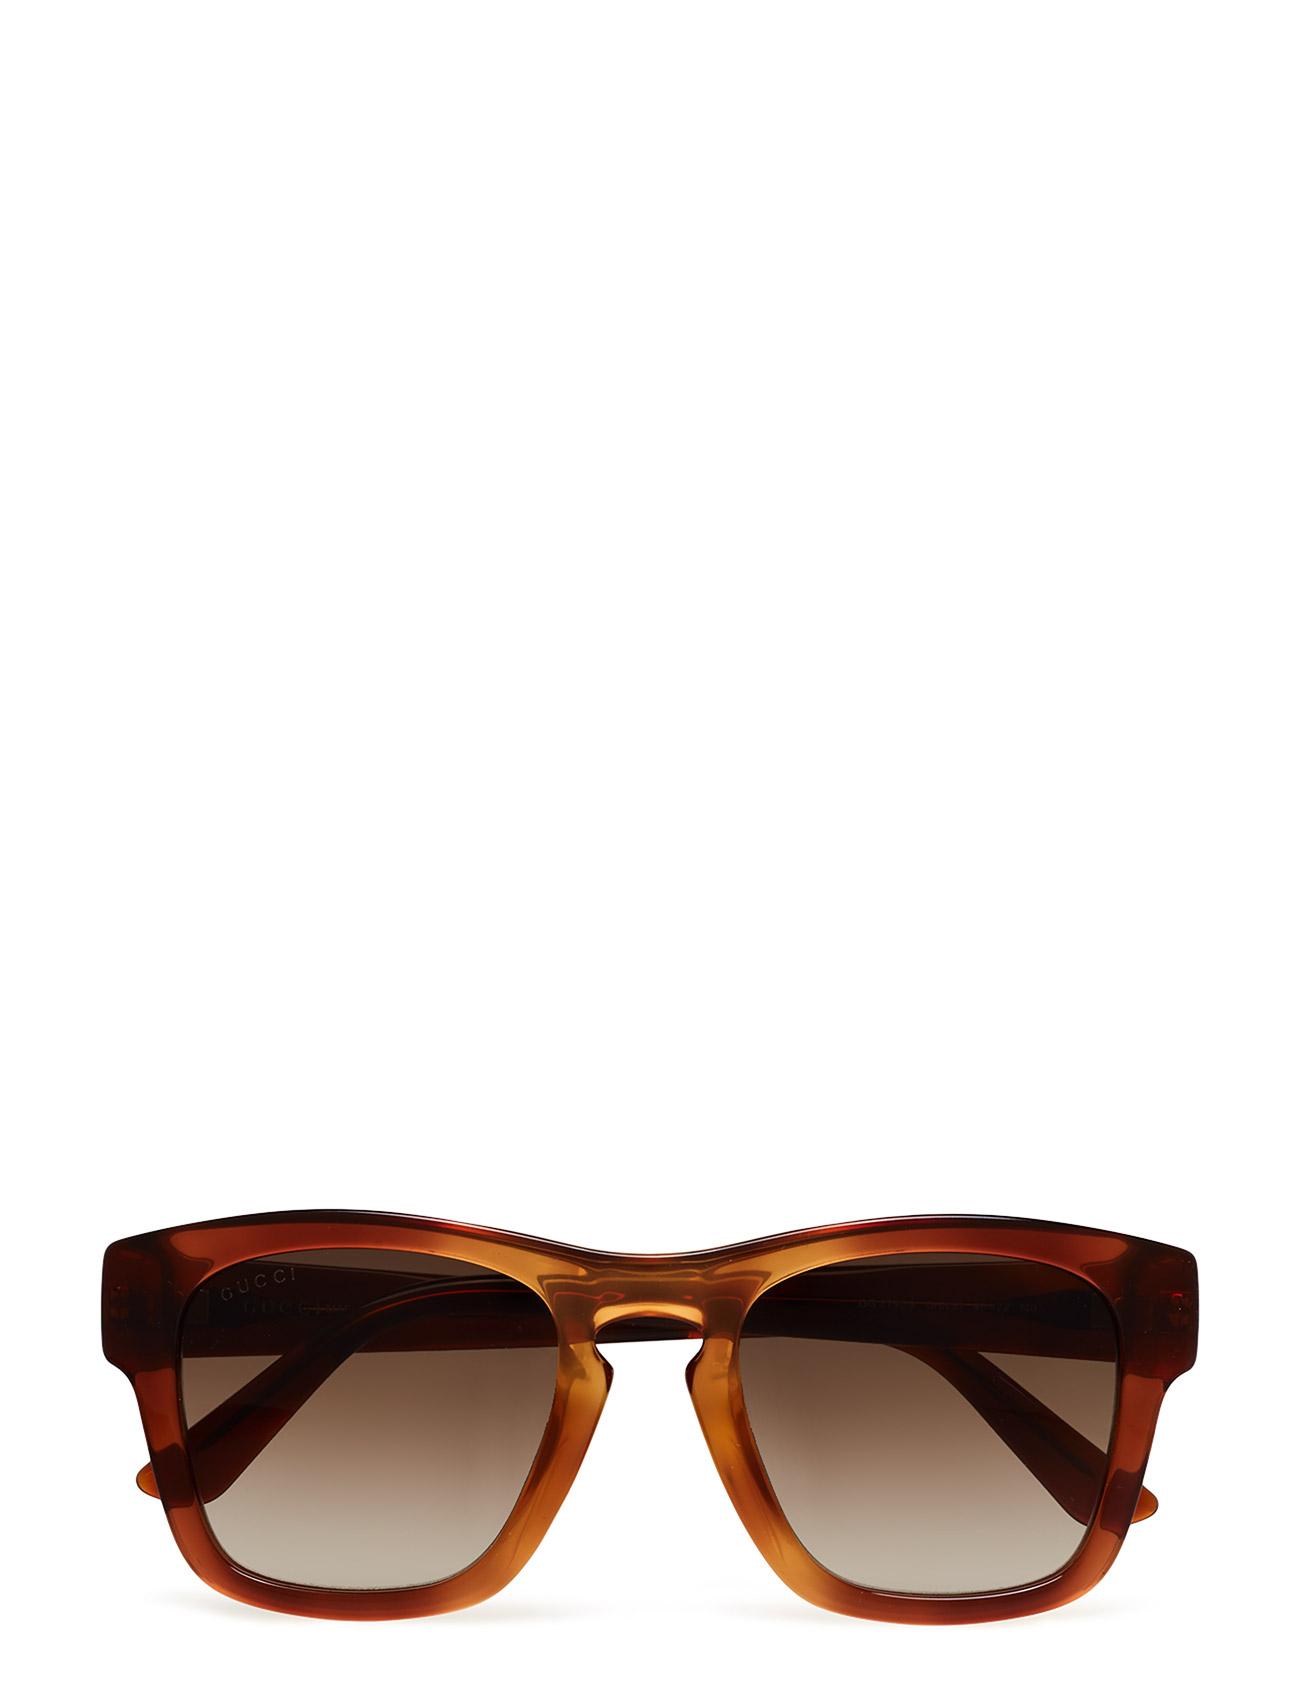 Gg 3791/S Gucci Sunglasses Solbriller til Damer i